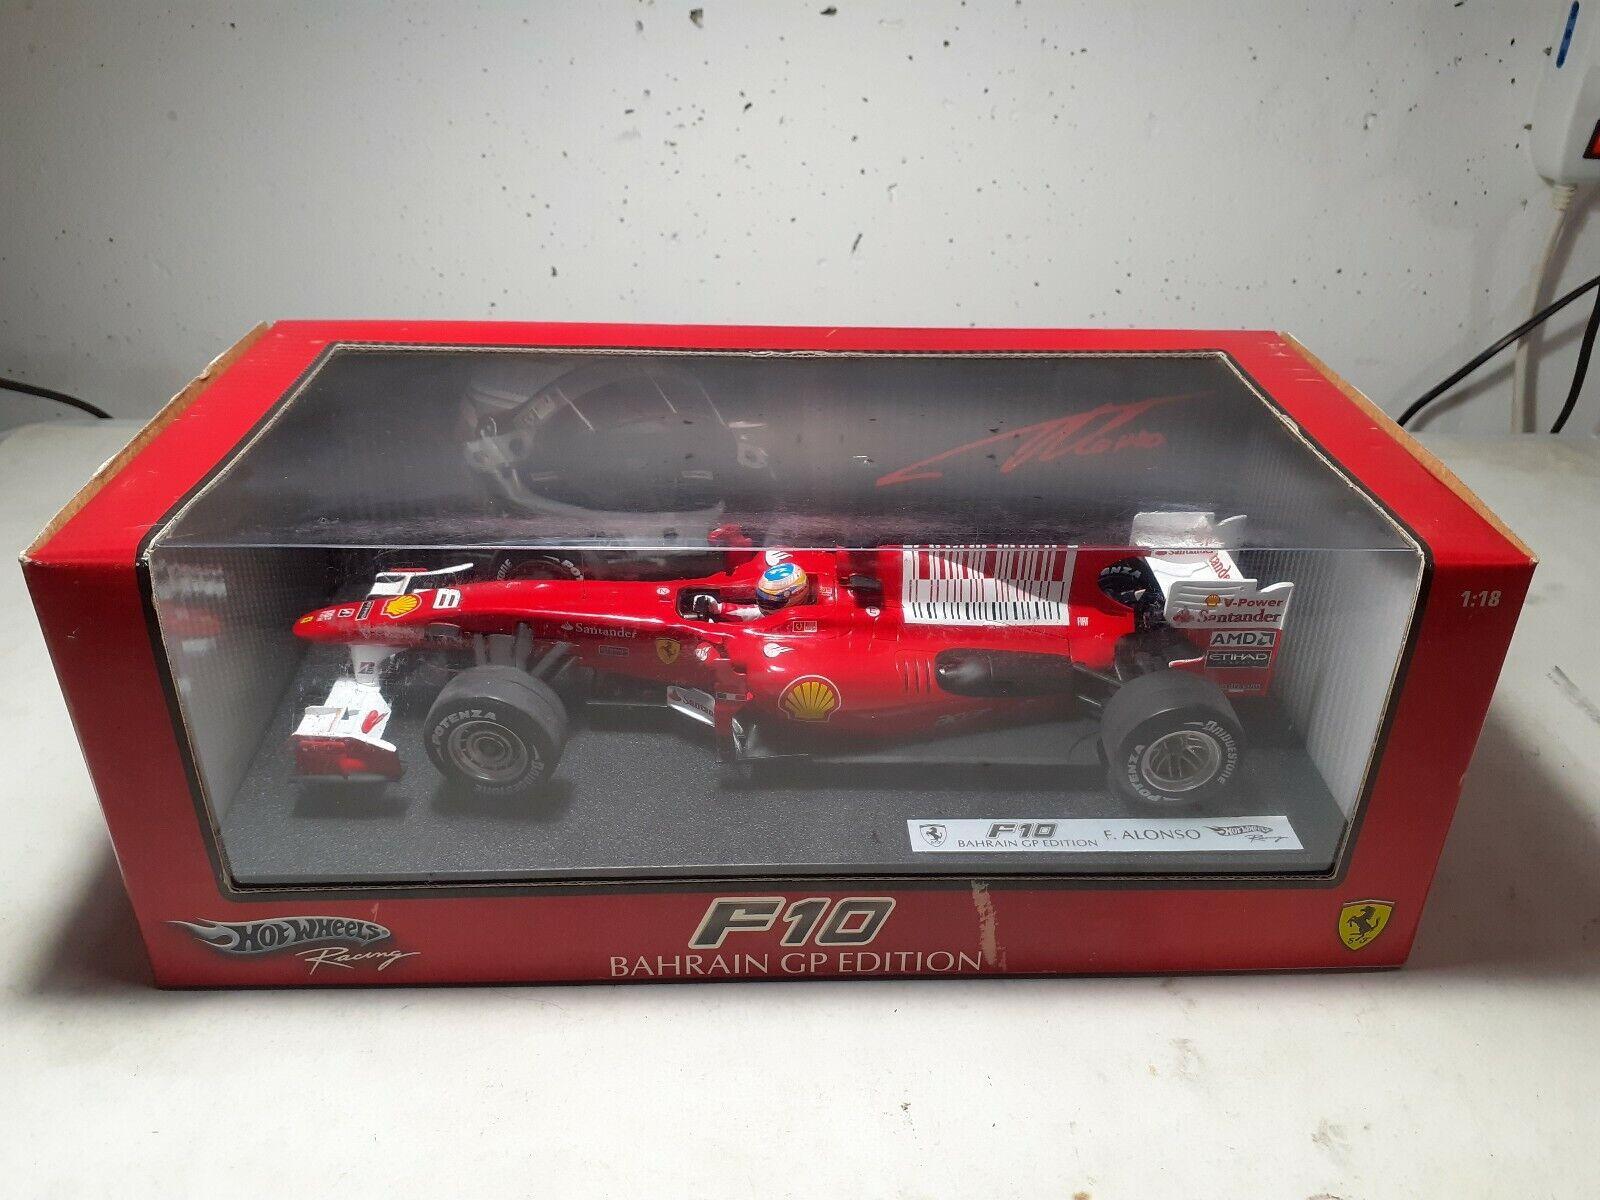 F10 Bahrain Gp Ausgabe Fernando Alonso, 1 18 heißWHEELS